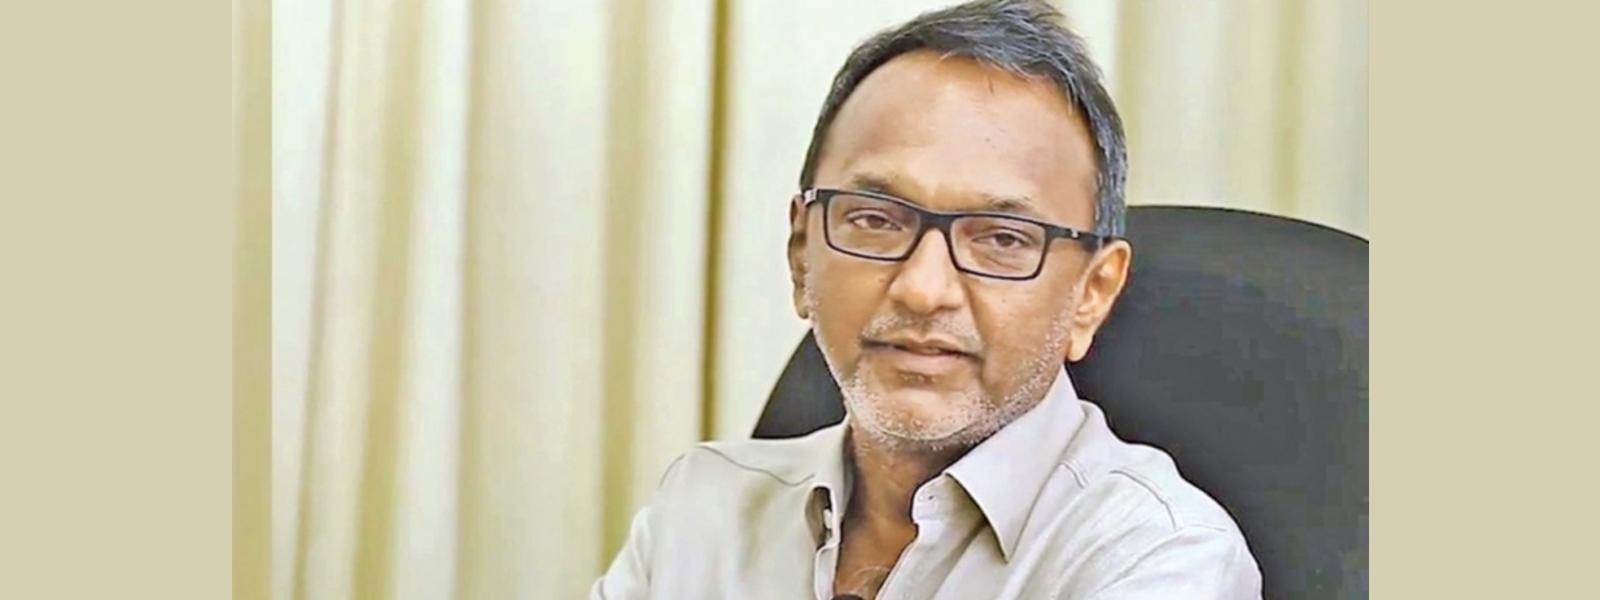 GoSL preparing for crackdown on journalists and social media: SJB MP Bakeer Markar